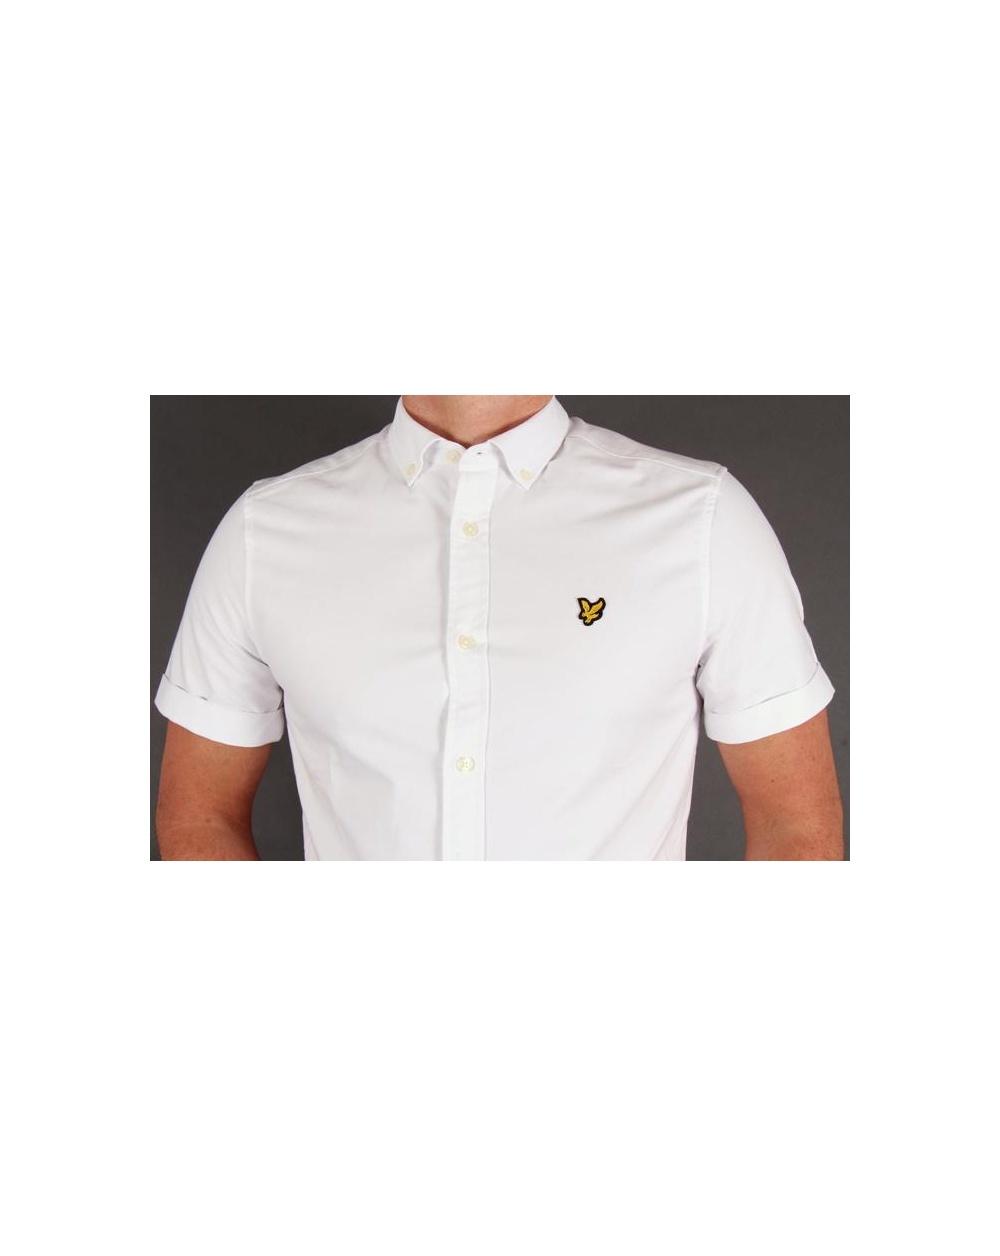 Lyle And Scott Short Sleeve Oxford Shirt White